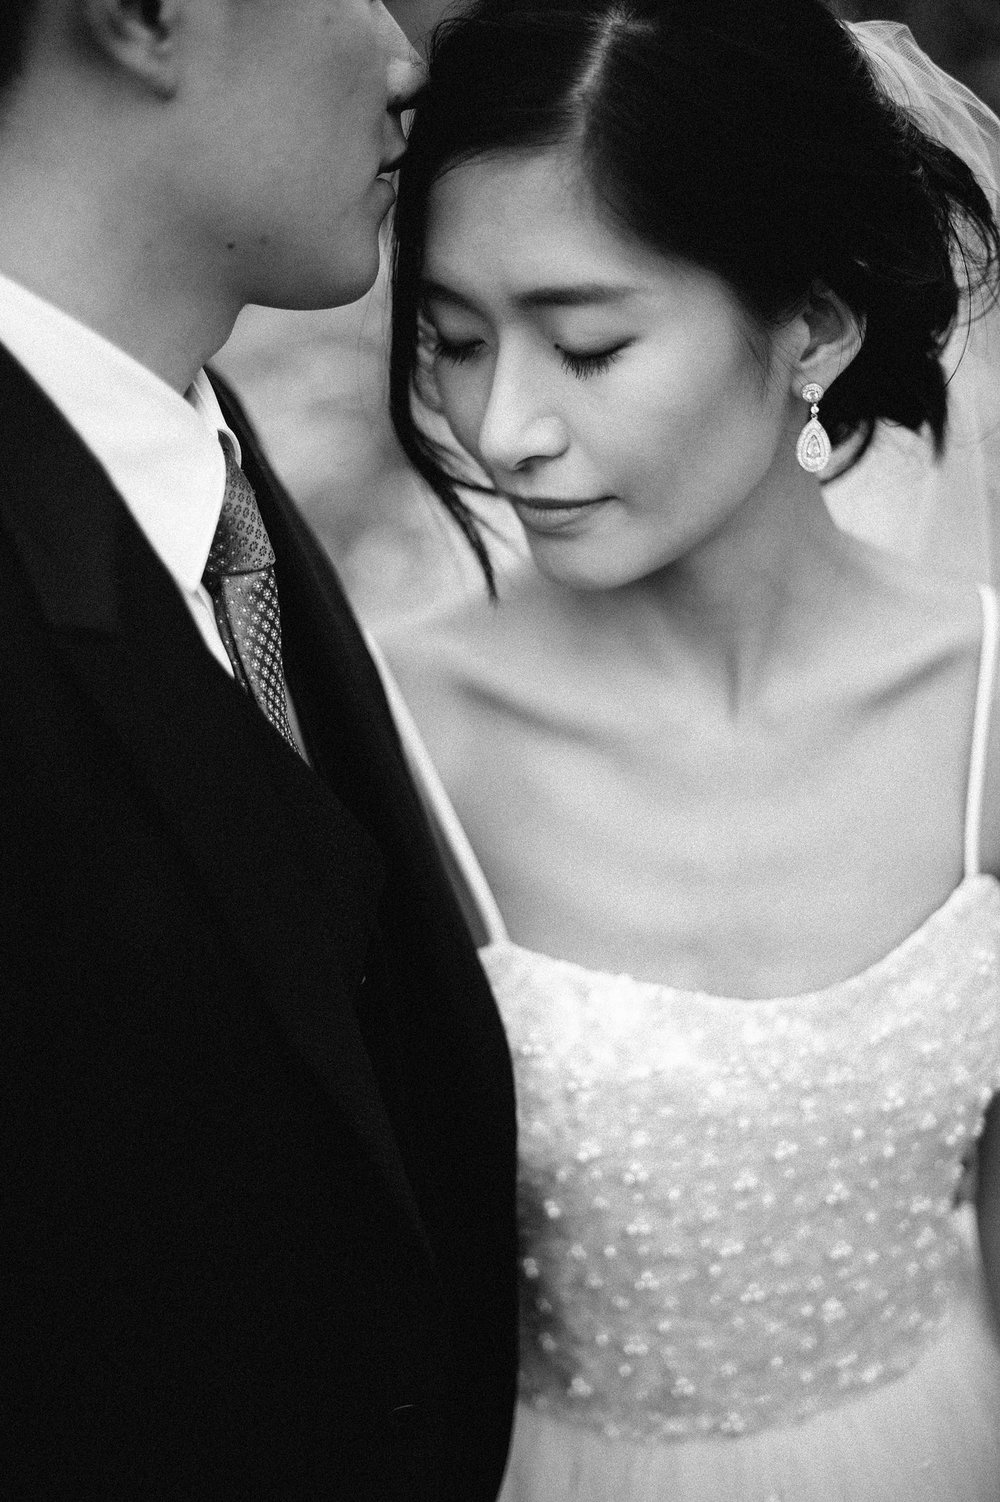 Chris_Hui_婚禮_婚紗照_pre_wedding_photography_best_053_.jpg